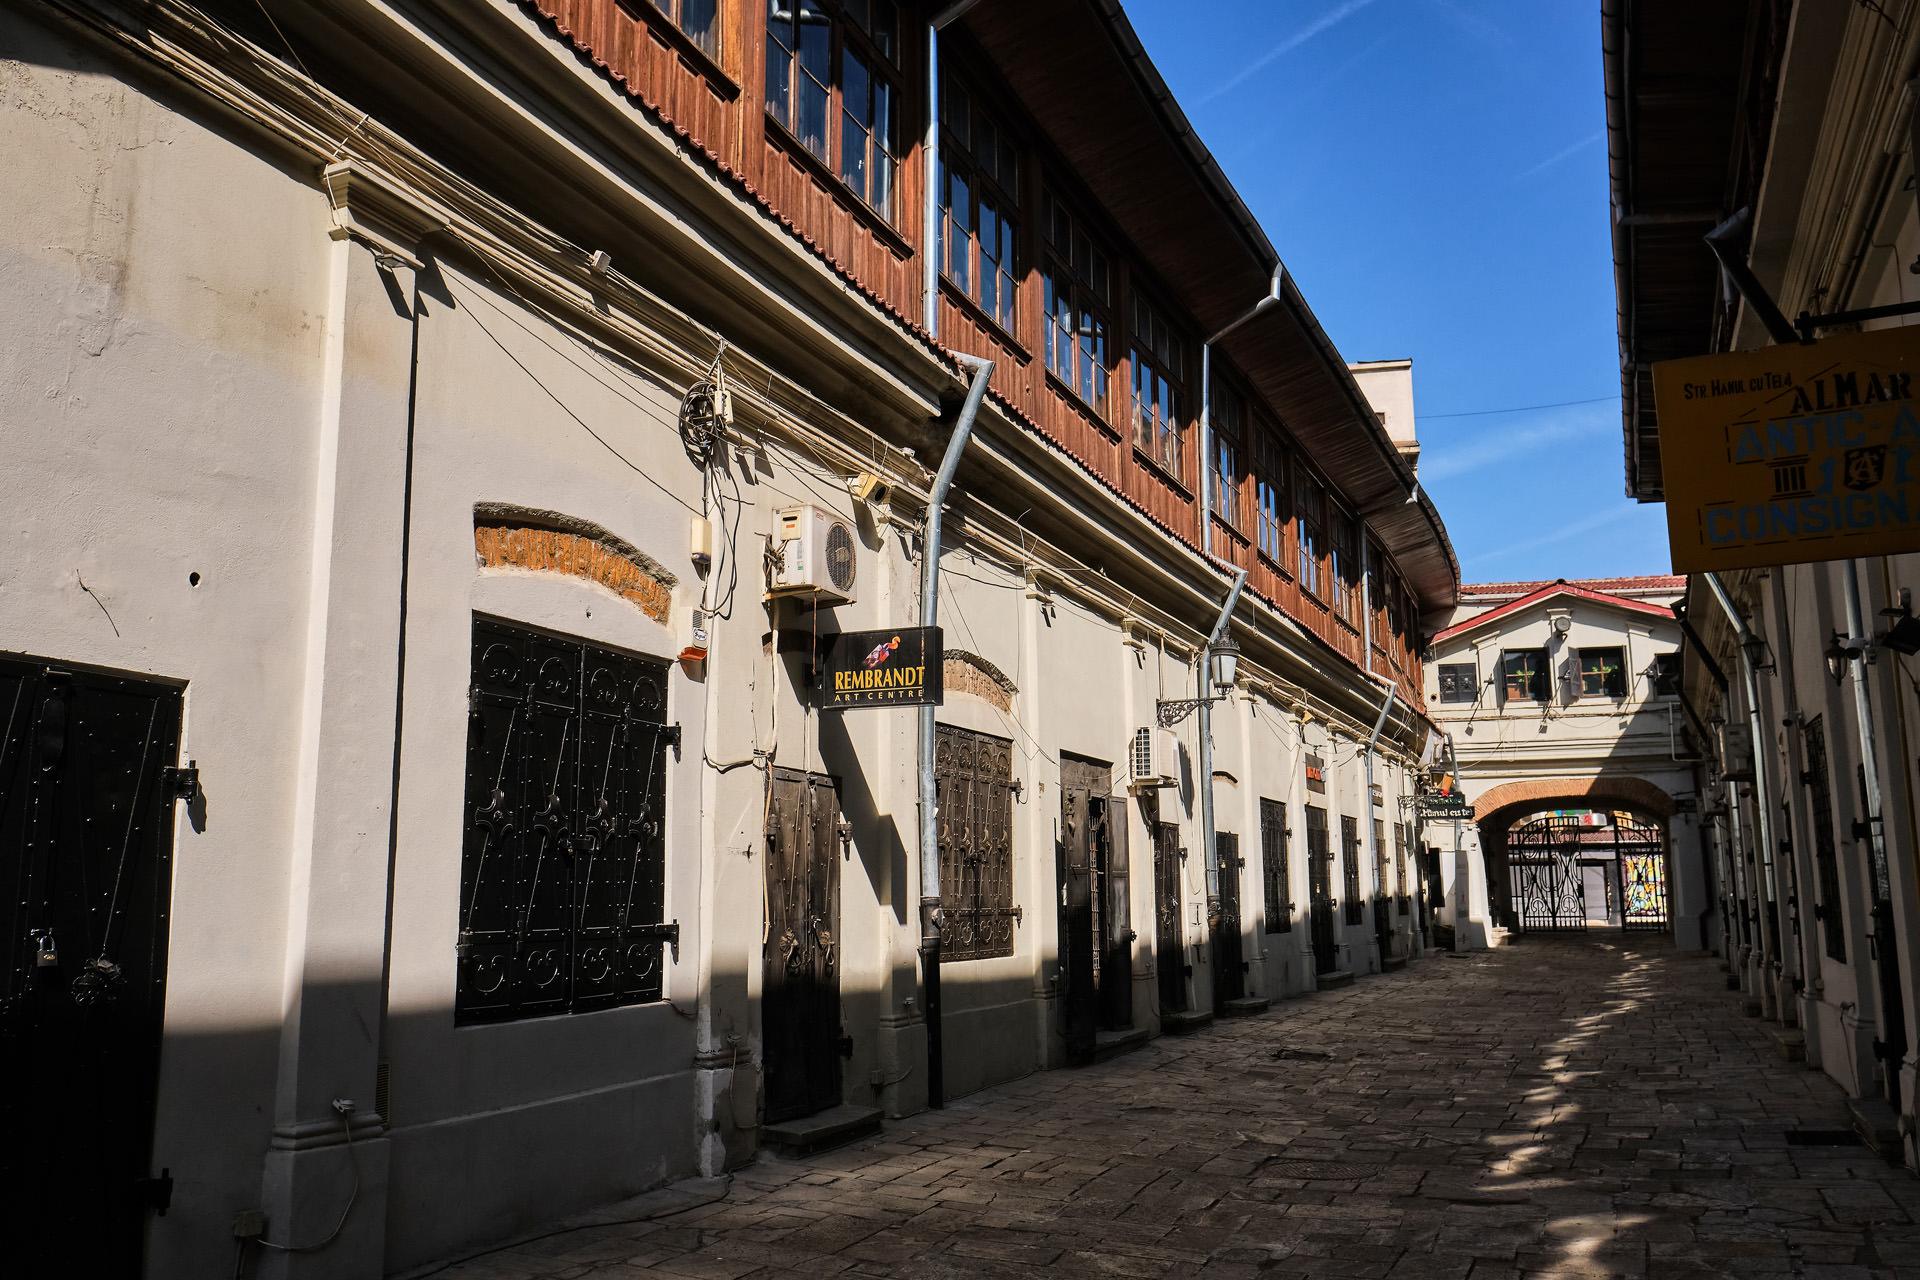 Bucharest Old Center The Linden Tree Inn